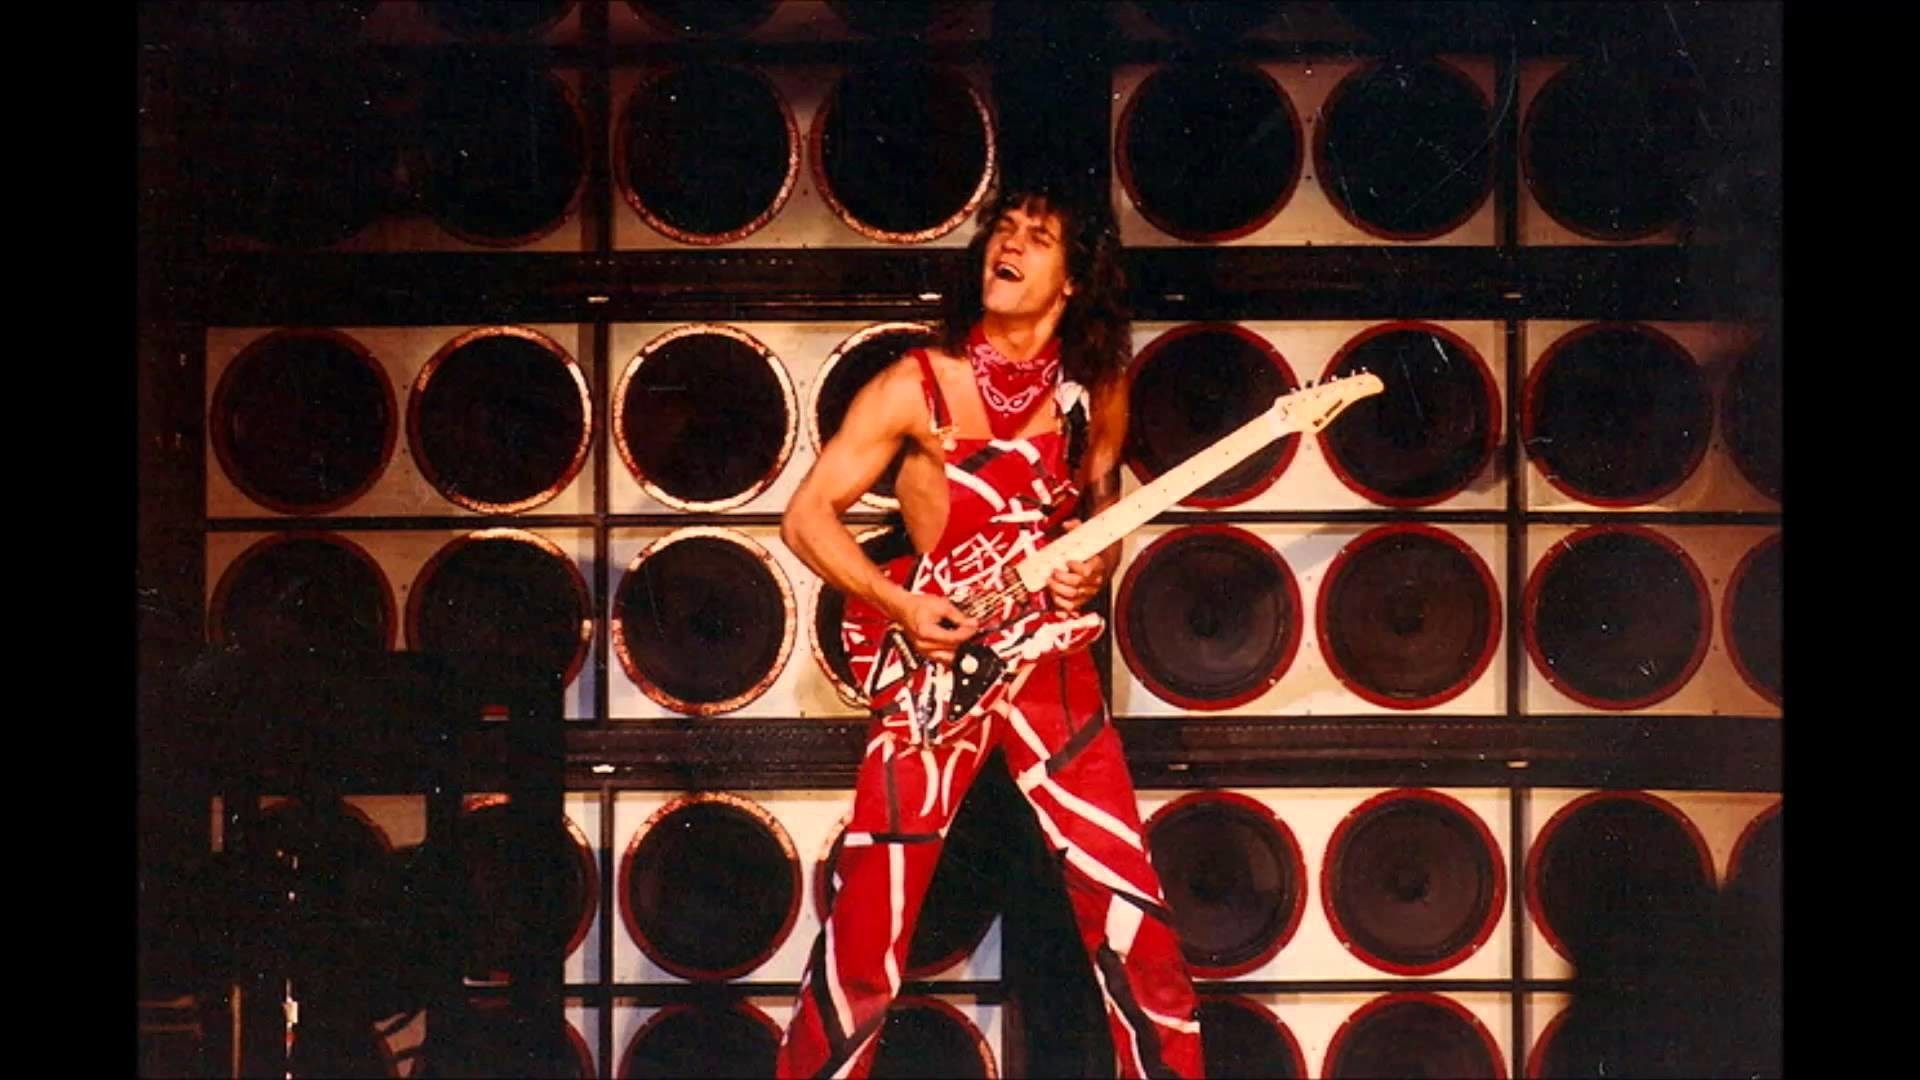 Res: 1920x1080, Van Halen Wallpaper HD 18 - 1920 X 1080